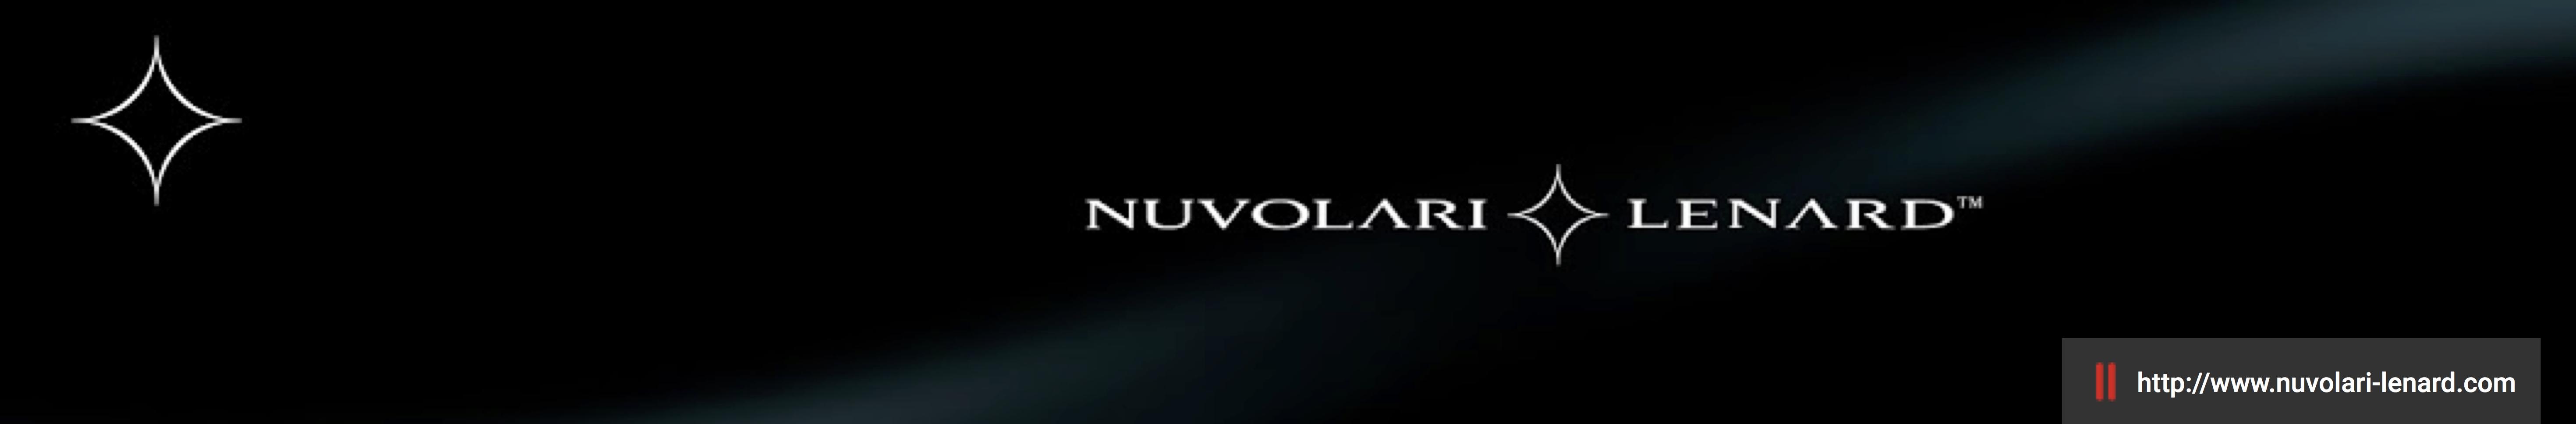 Nuvolari Lenard's YouTube banner